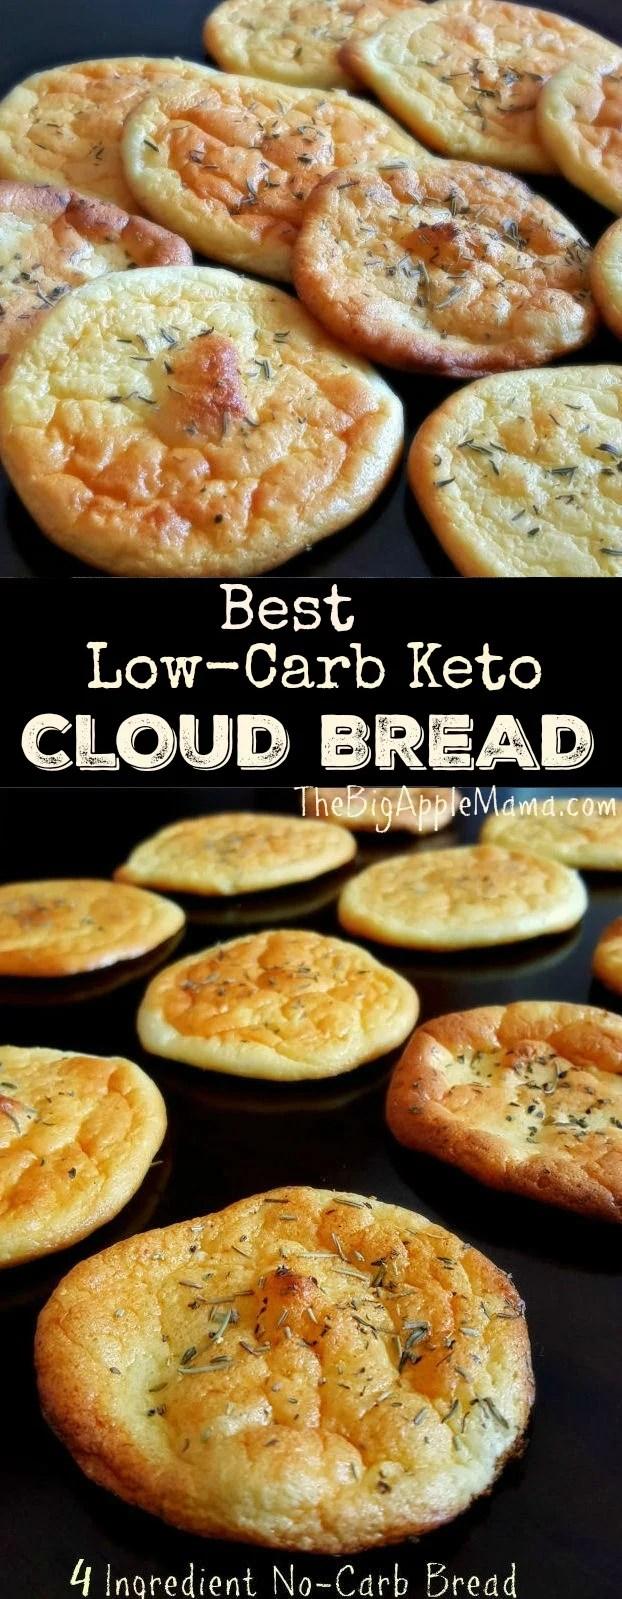 Best Low-Carb Keto Cloud Bread, Only 4 simple ingredients